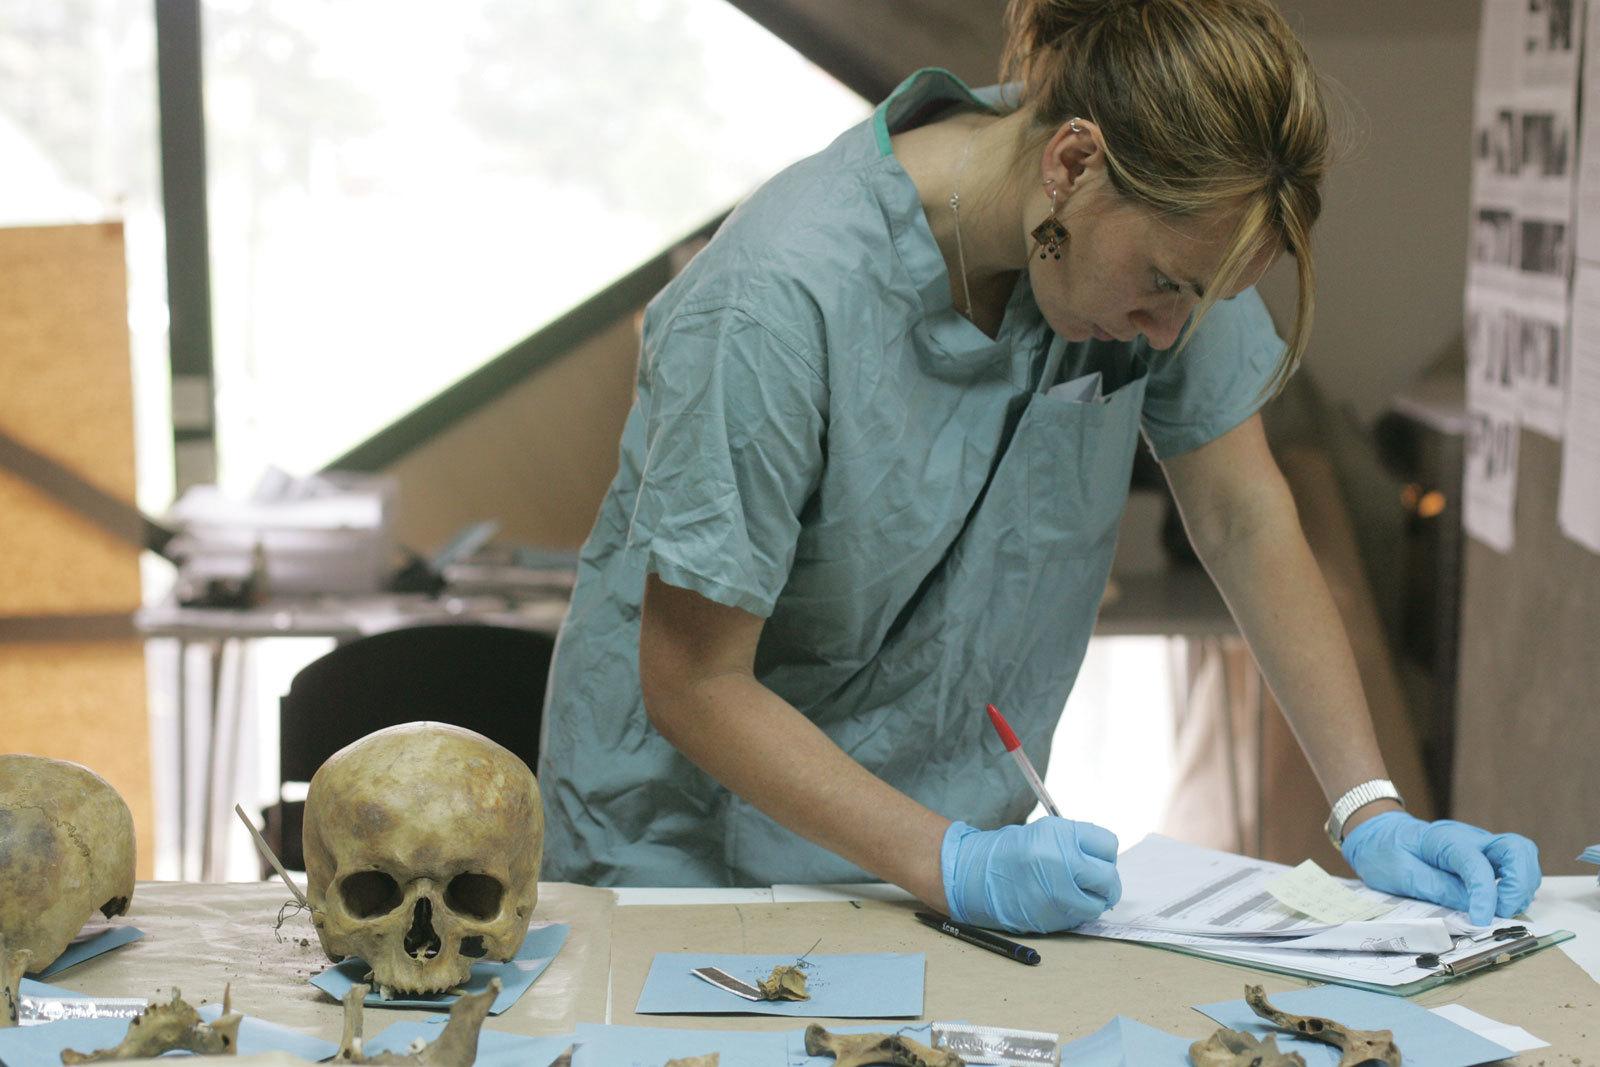 Forensic medical image of sex crimes